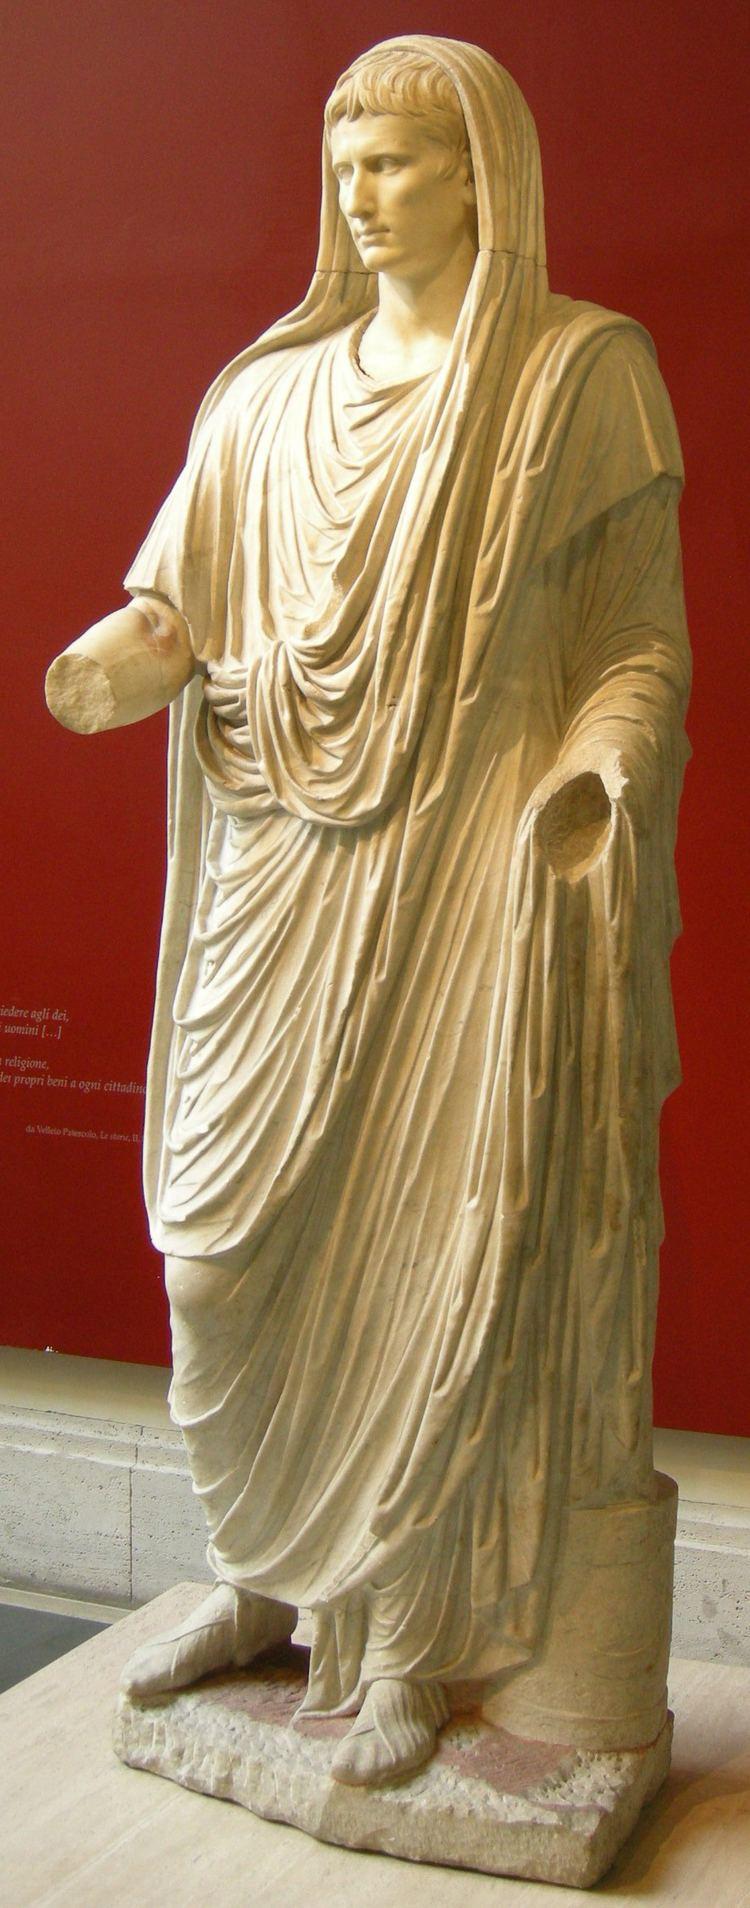 Via Labicana Augustus FileAugusto di via labicana 05JPG Wikimedia Commons